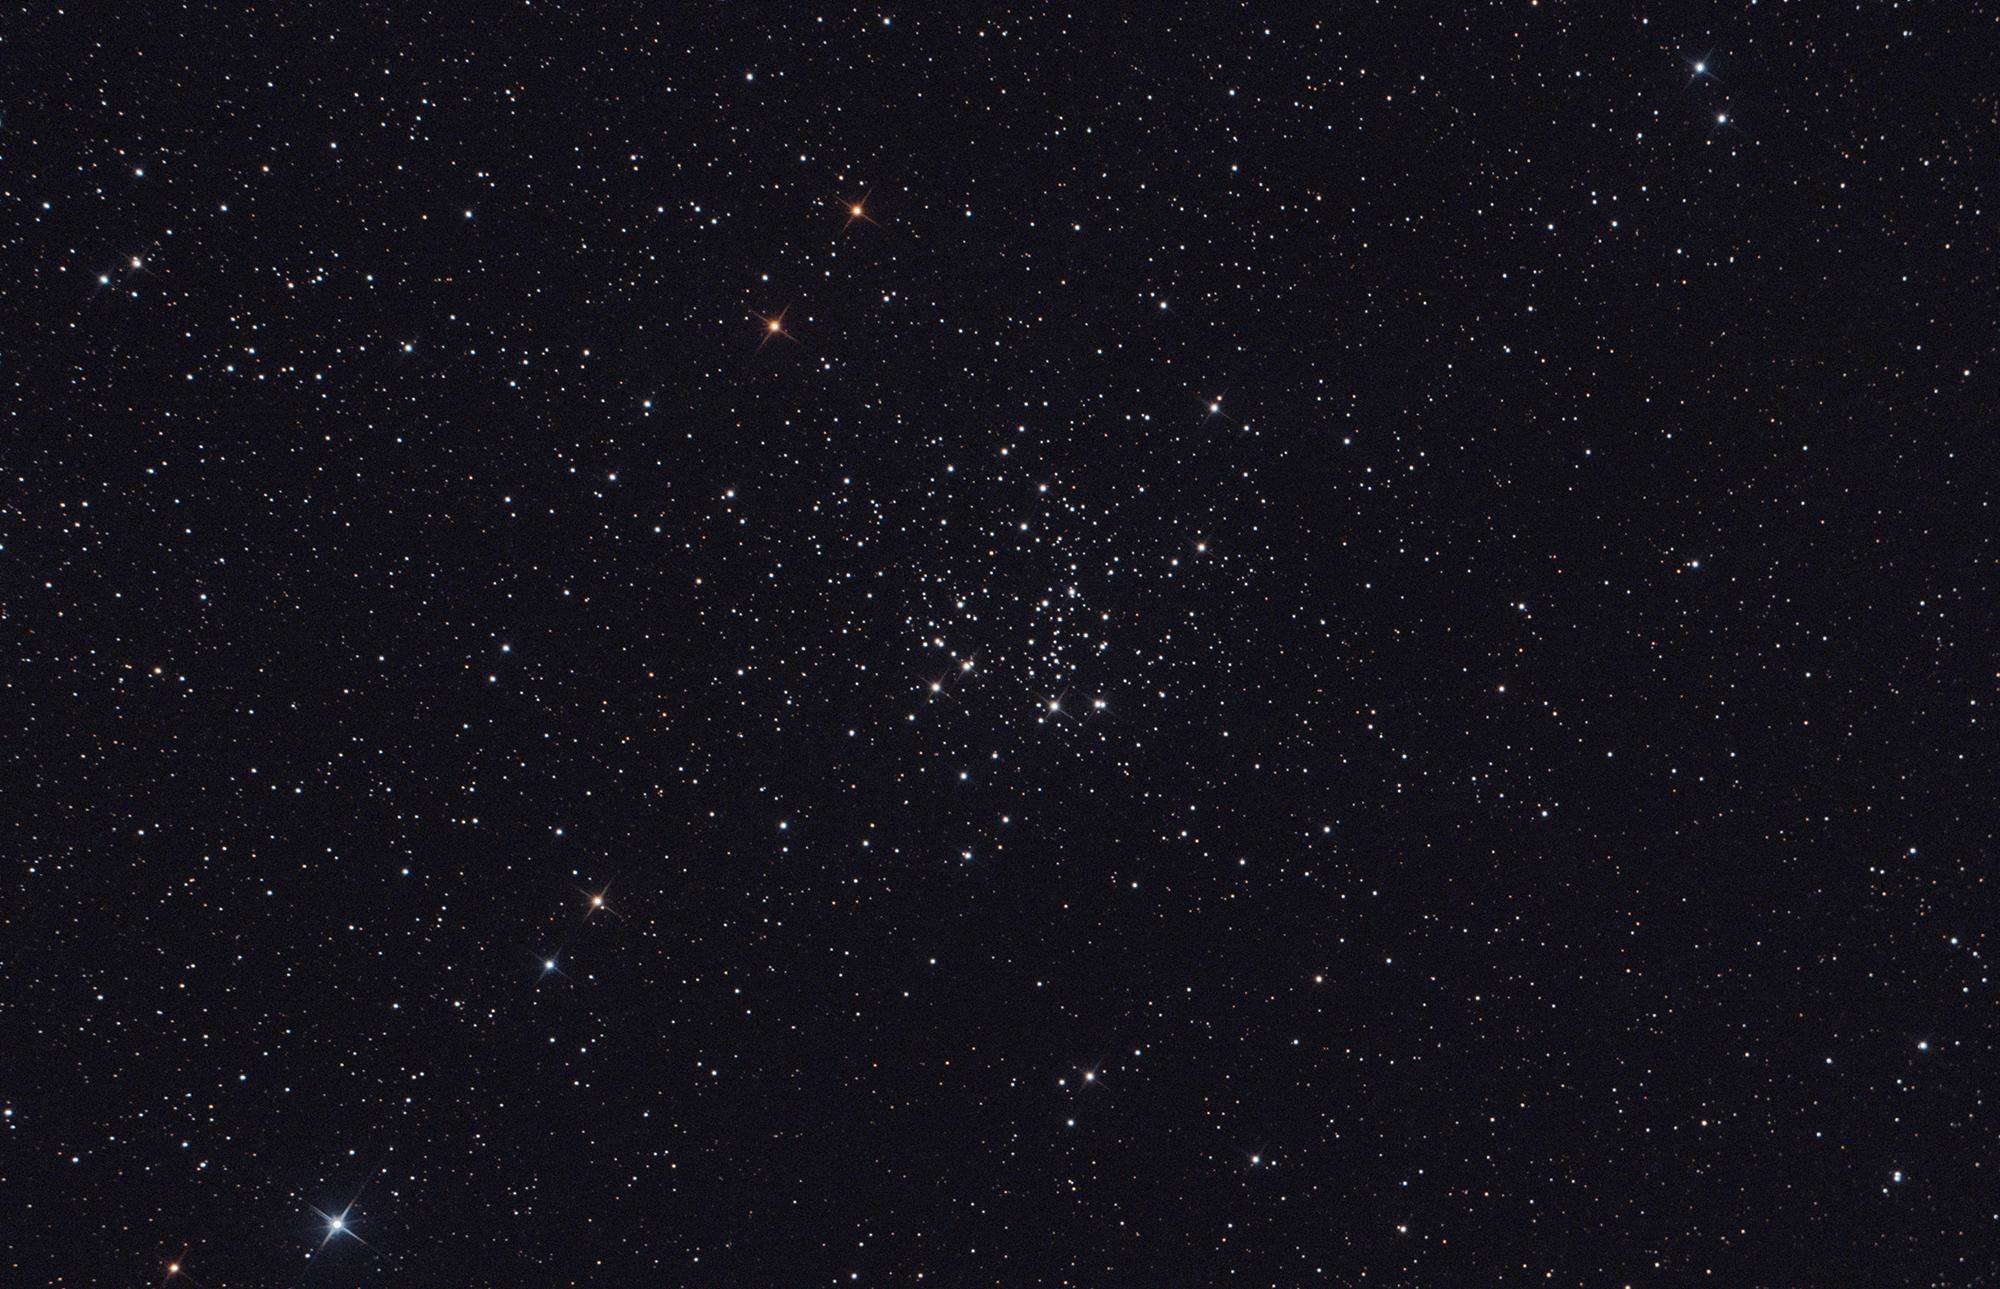 C10 NGC 663 Mark Phillips 250mm f4.8 Newtonian QHY168C